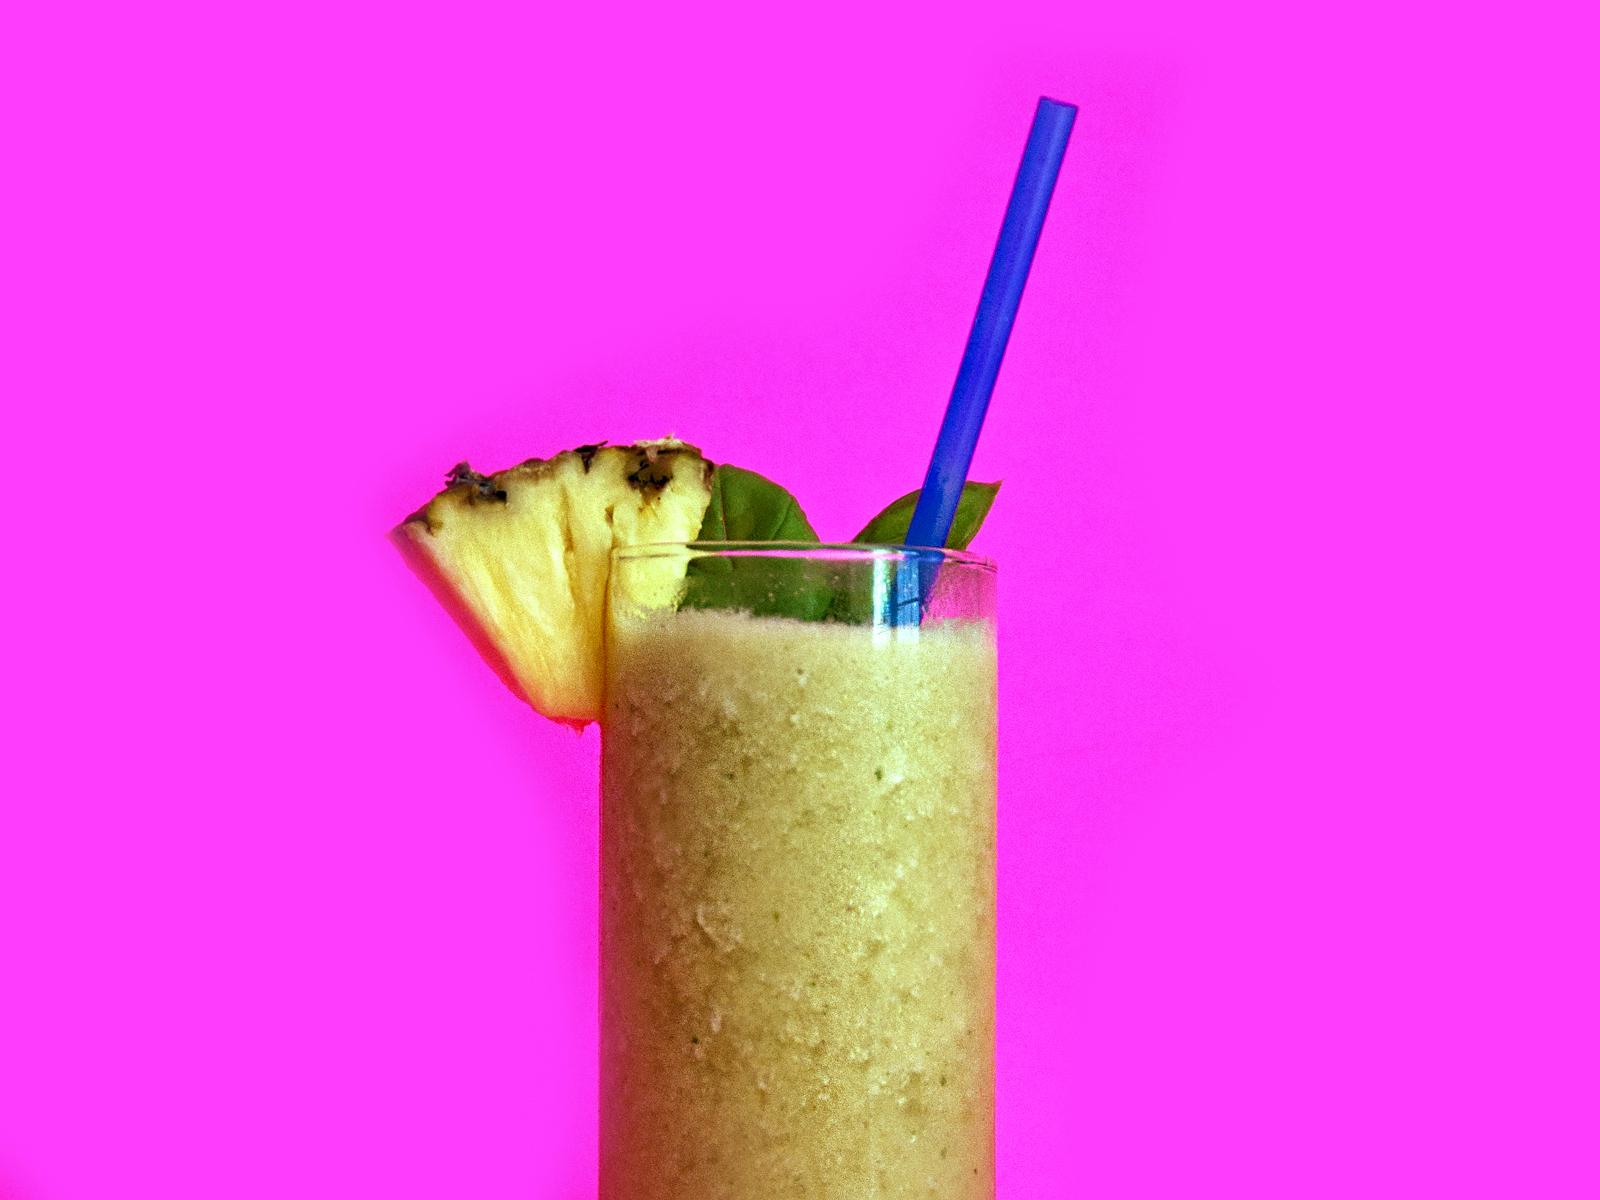 amy_chen_design_honey_basil_pineapple_banana_smoothie_1.jpg